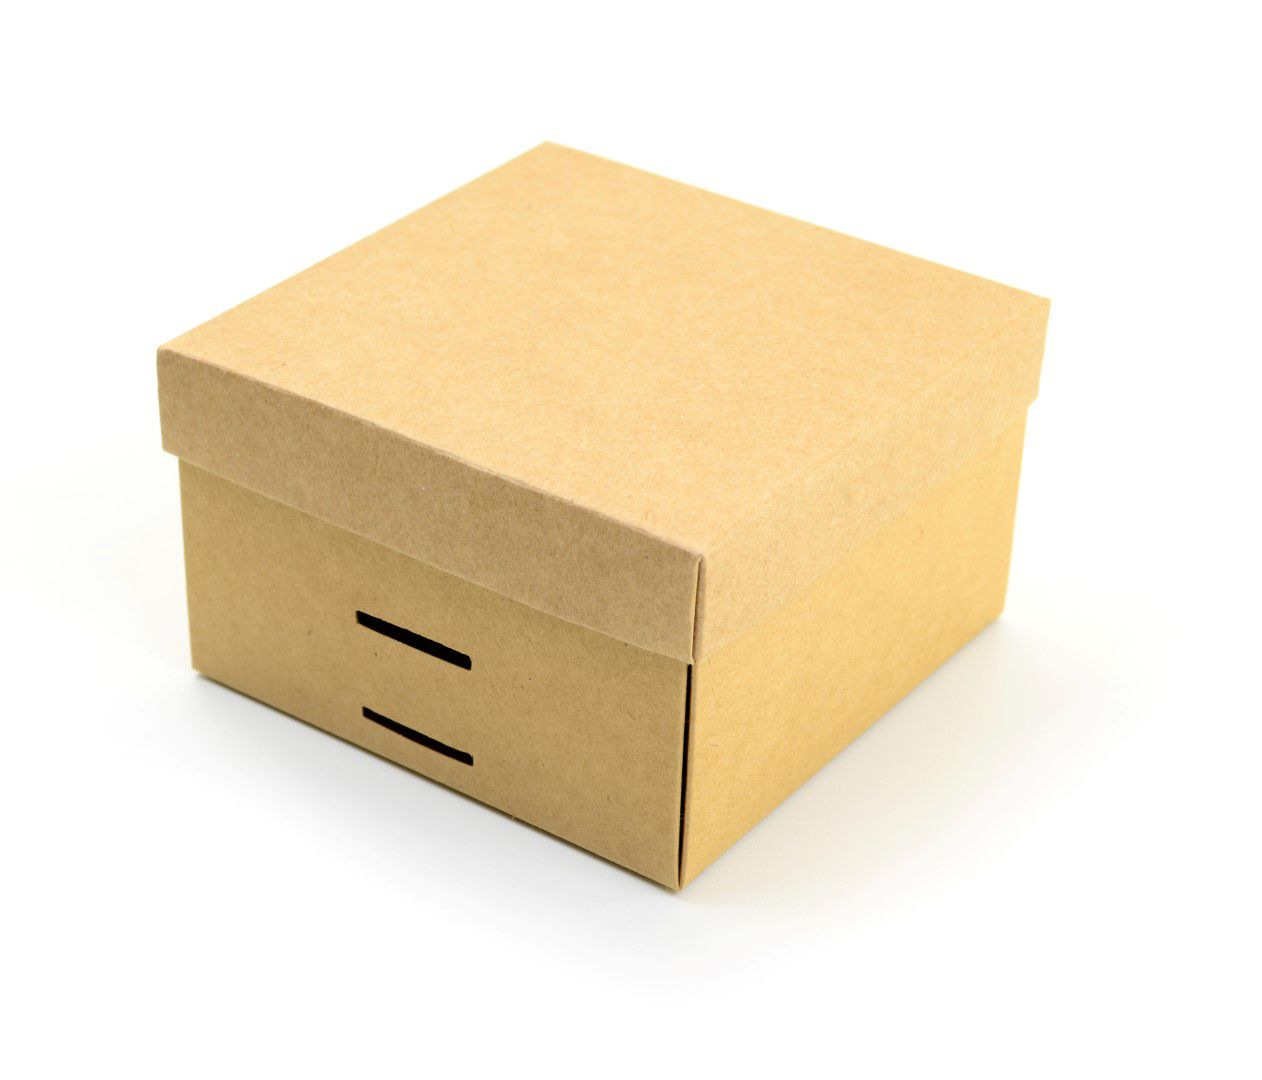 Ref 097 Kraft - Caixa c/ tampa papel e passa-fita - 13x13x8 cm - c/ 10 unidades